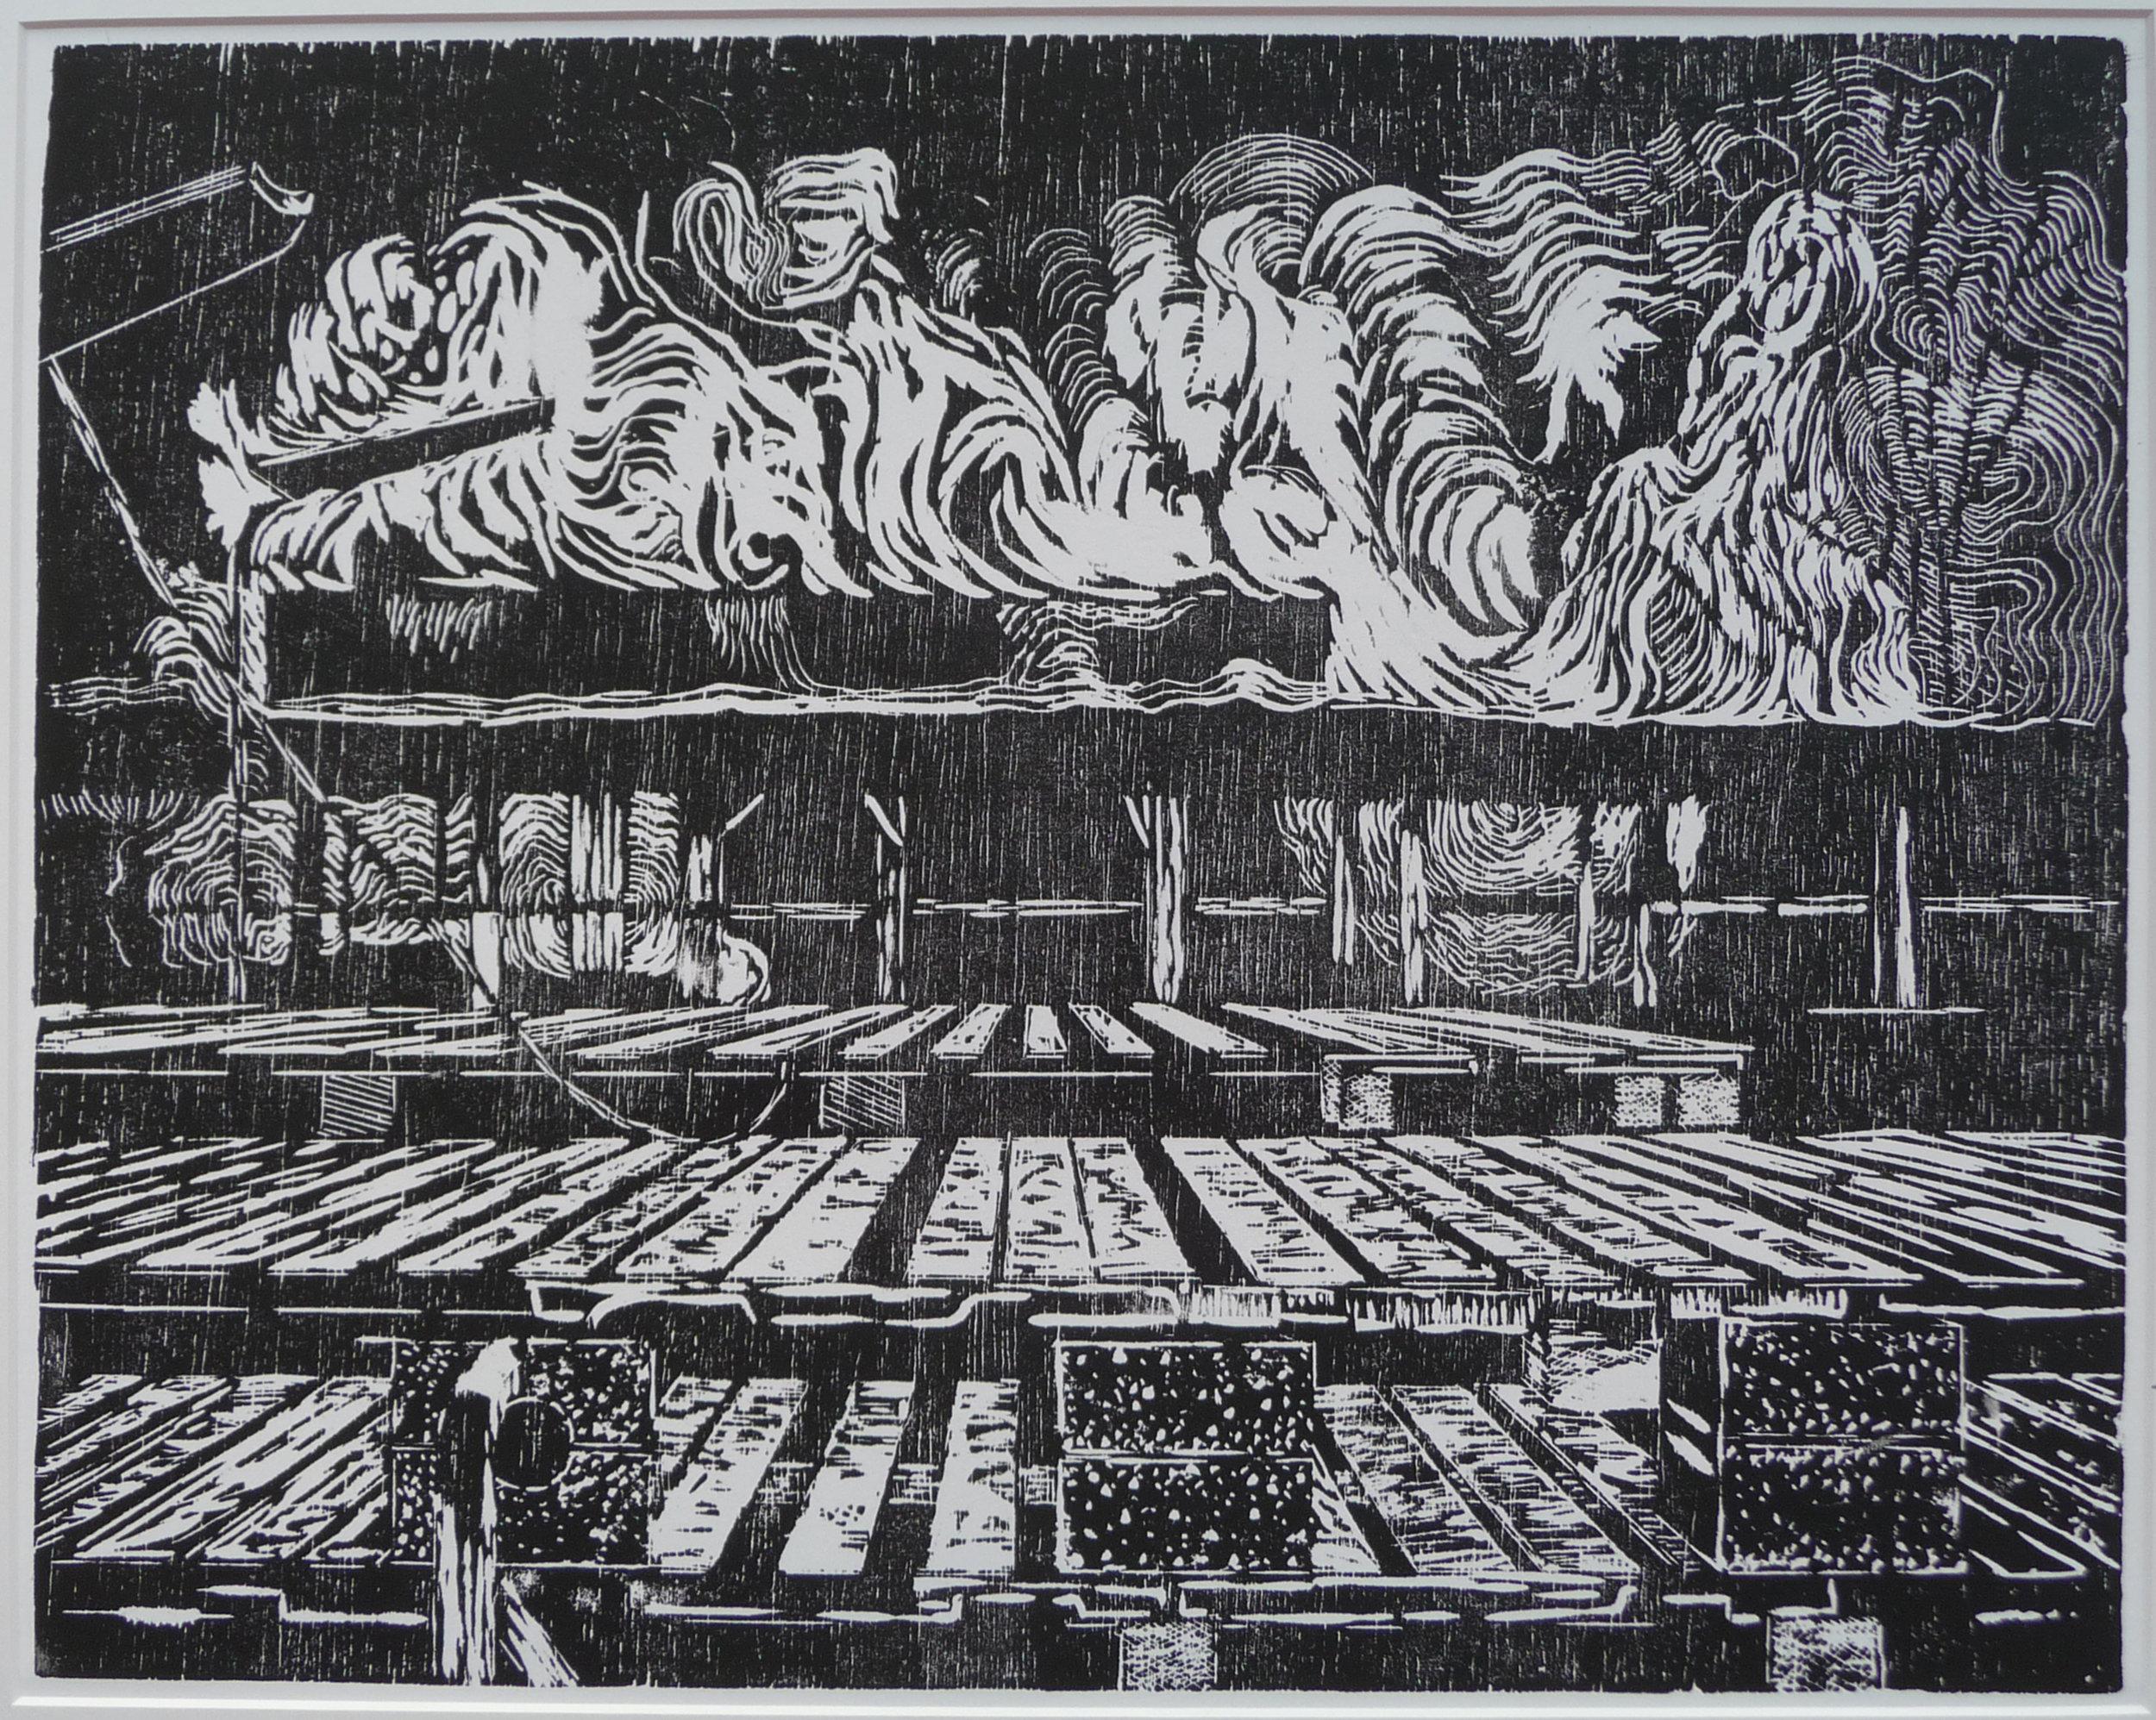 Z.t. woodcut, 39 x 49 cm, 2012